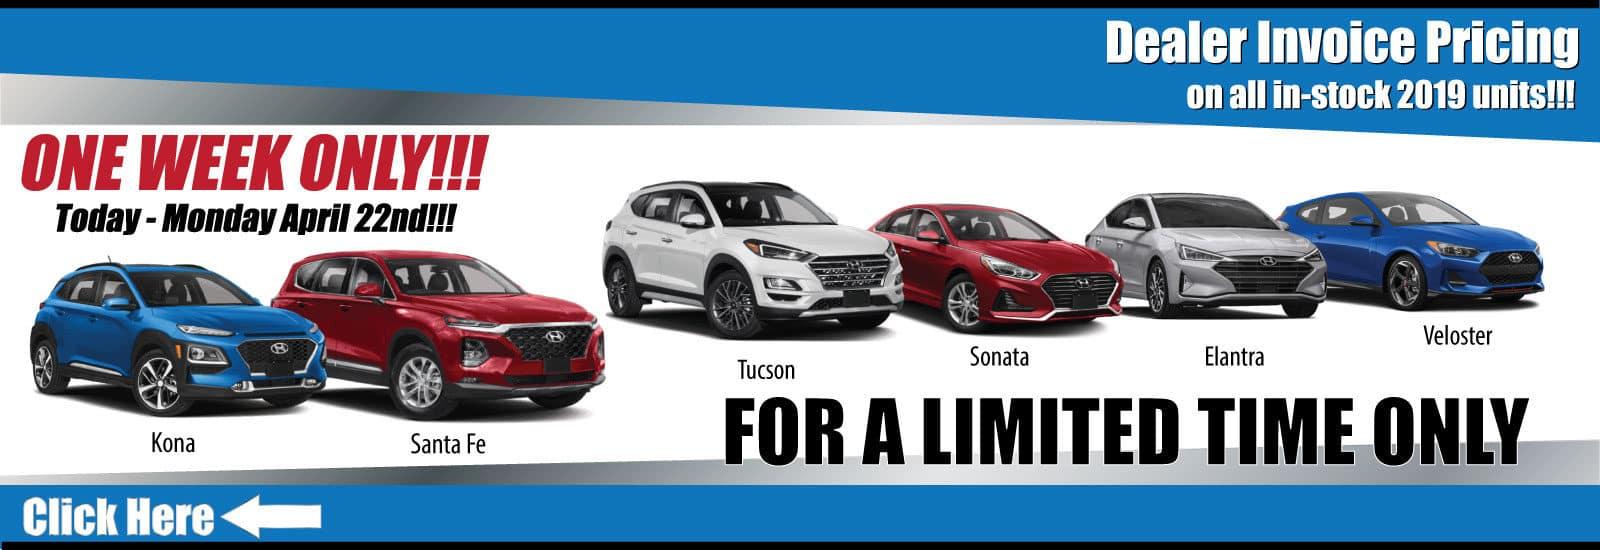 Hyundai-Dealer-Invoice-Pricing-Web-Banner-1600x550